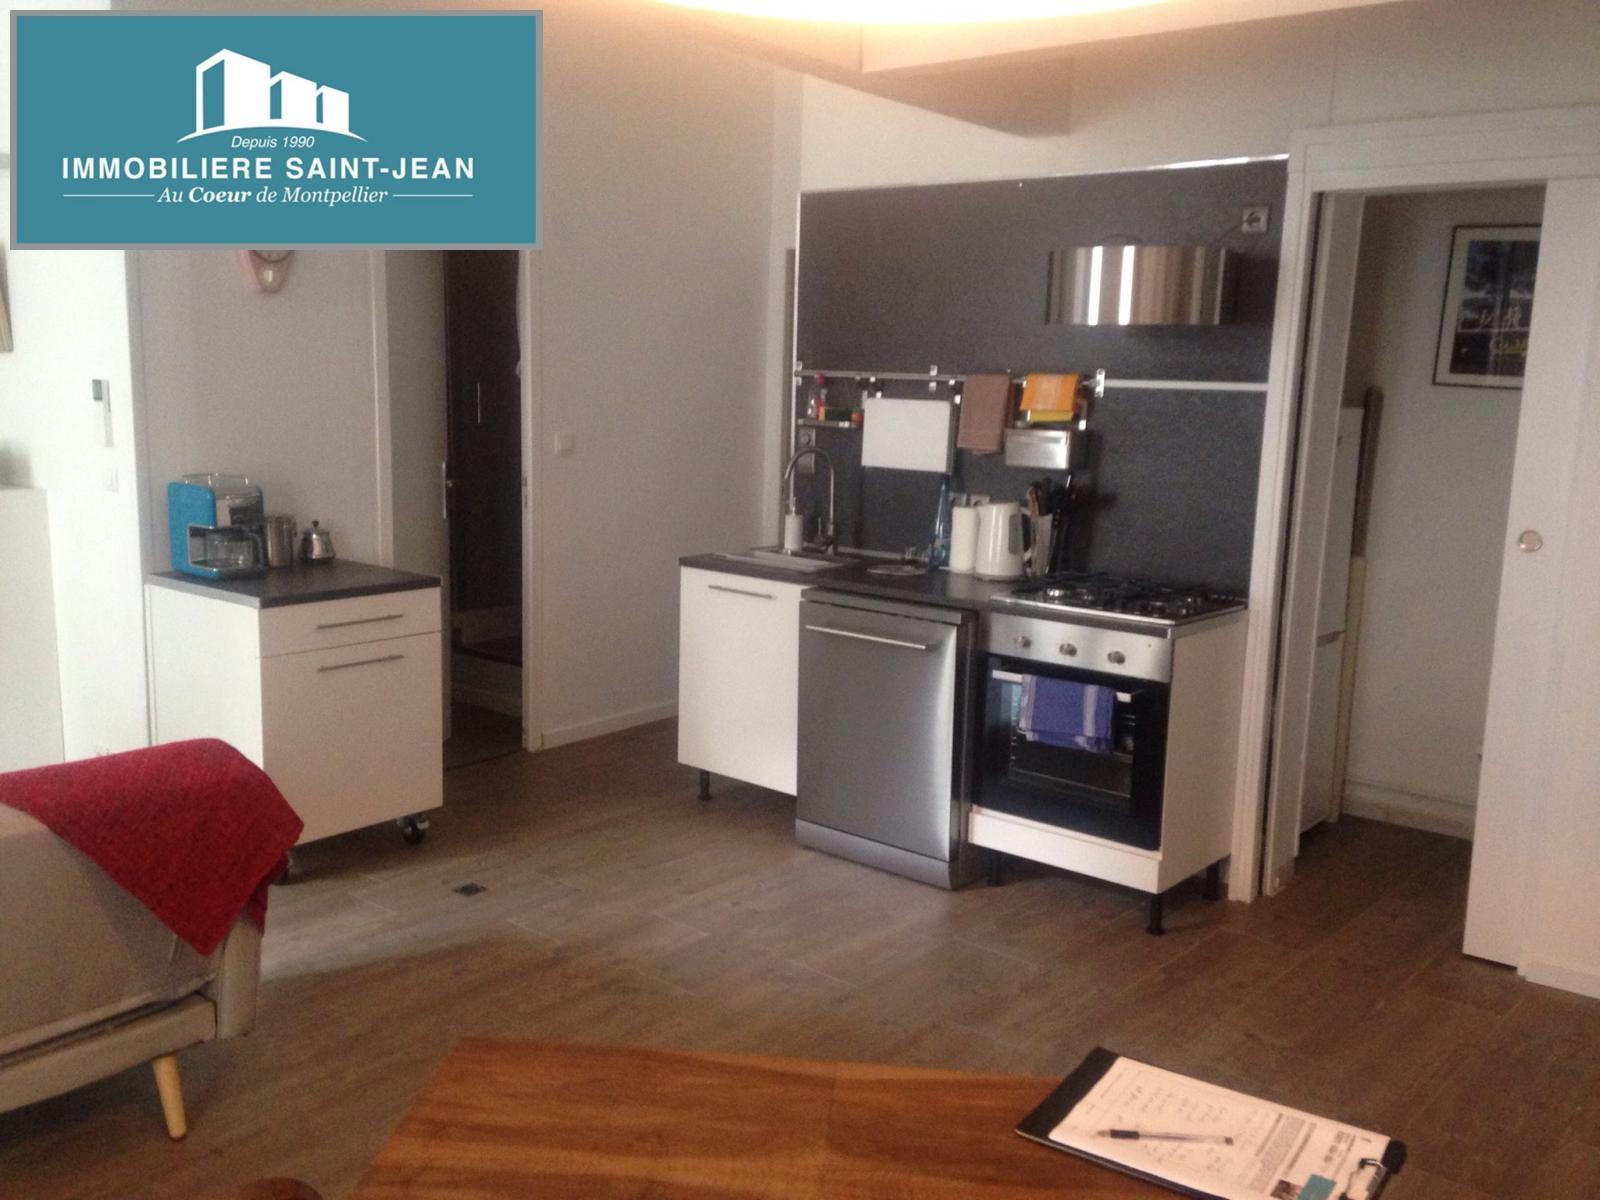 annonce vente appartement montpellier 34000 50 m 170 000 992738586830. Black Bedroom Furniture Sets. Home Design Ideas